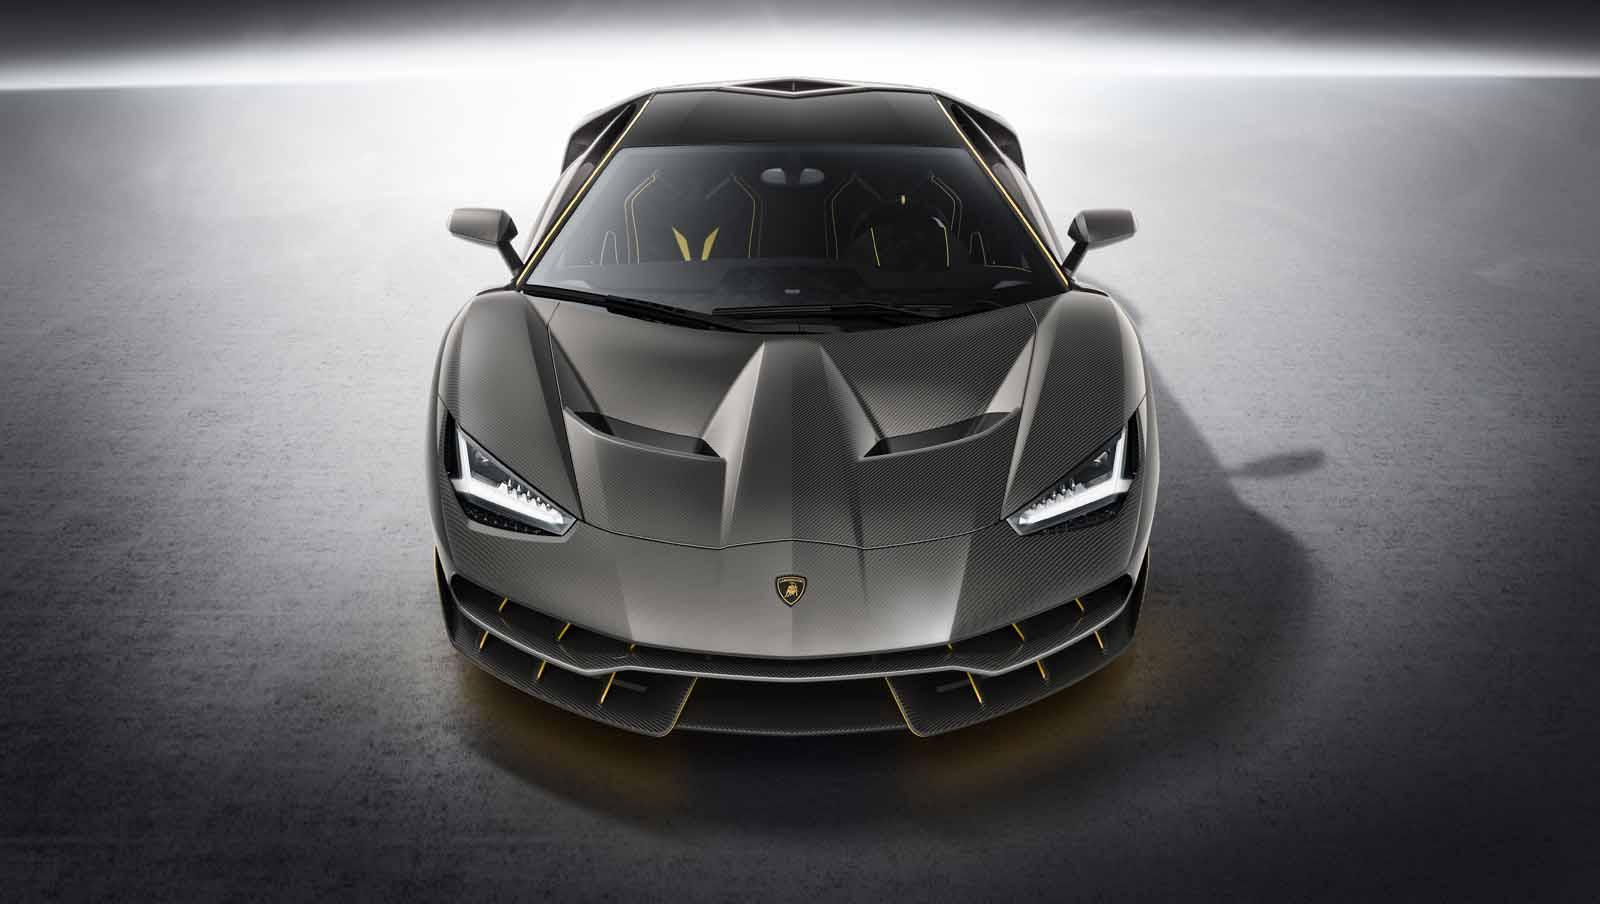 Lamborghini Centenario Roadster Set to Debut This Week